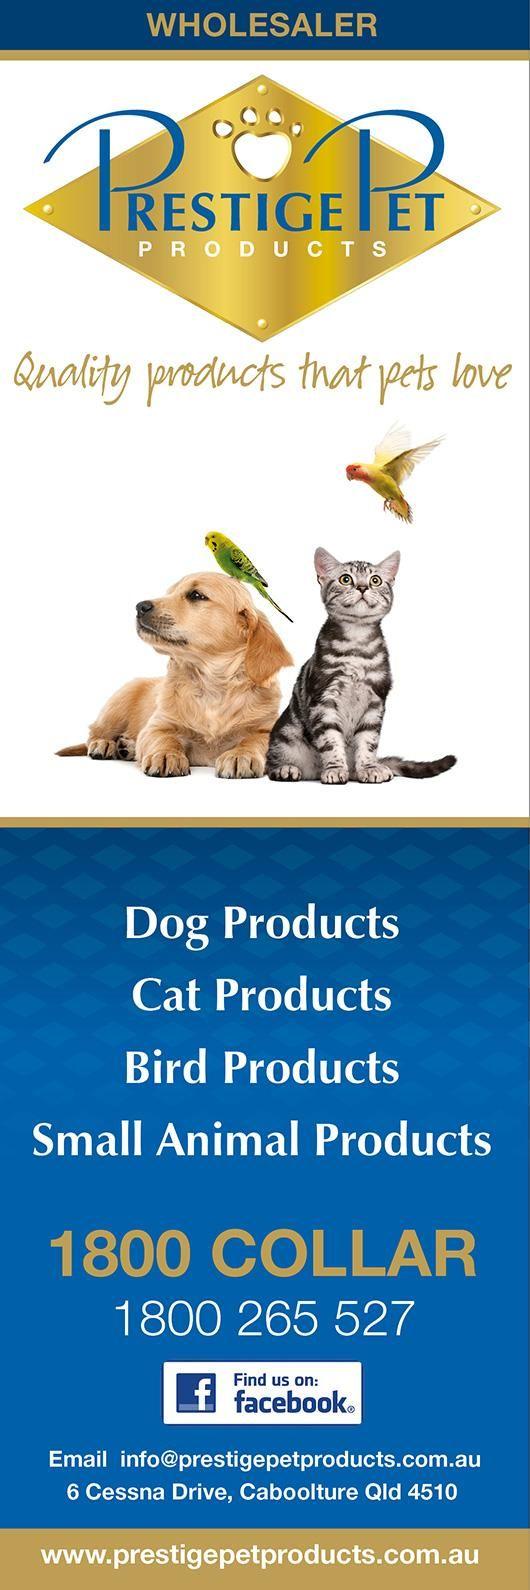 Prestige Pet Products Pty Ltd - Promotion